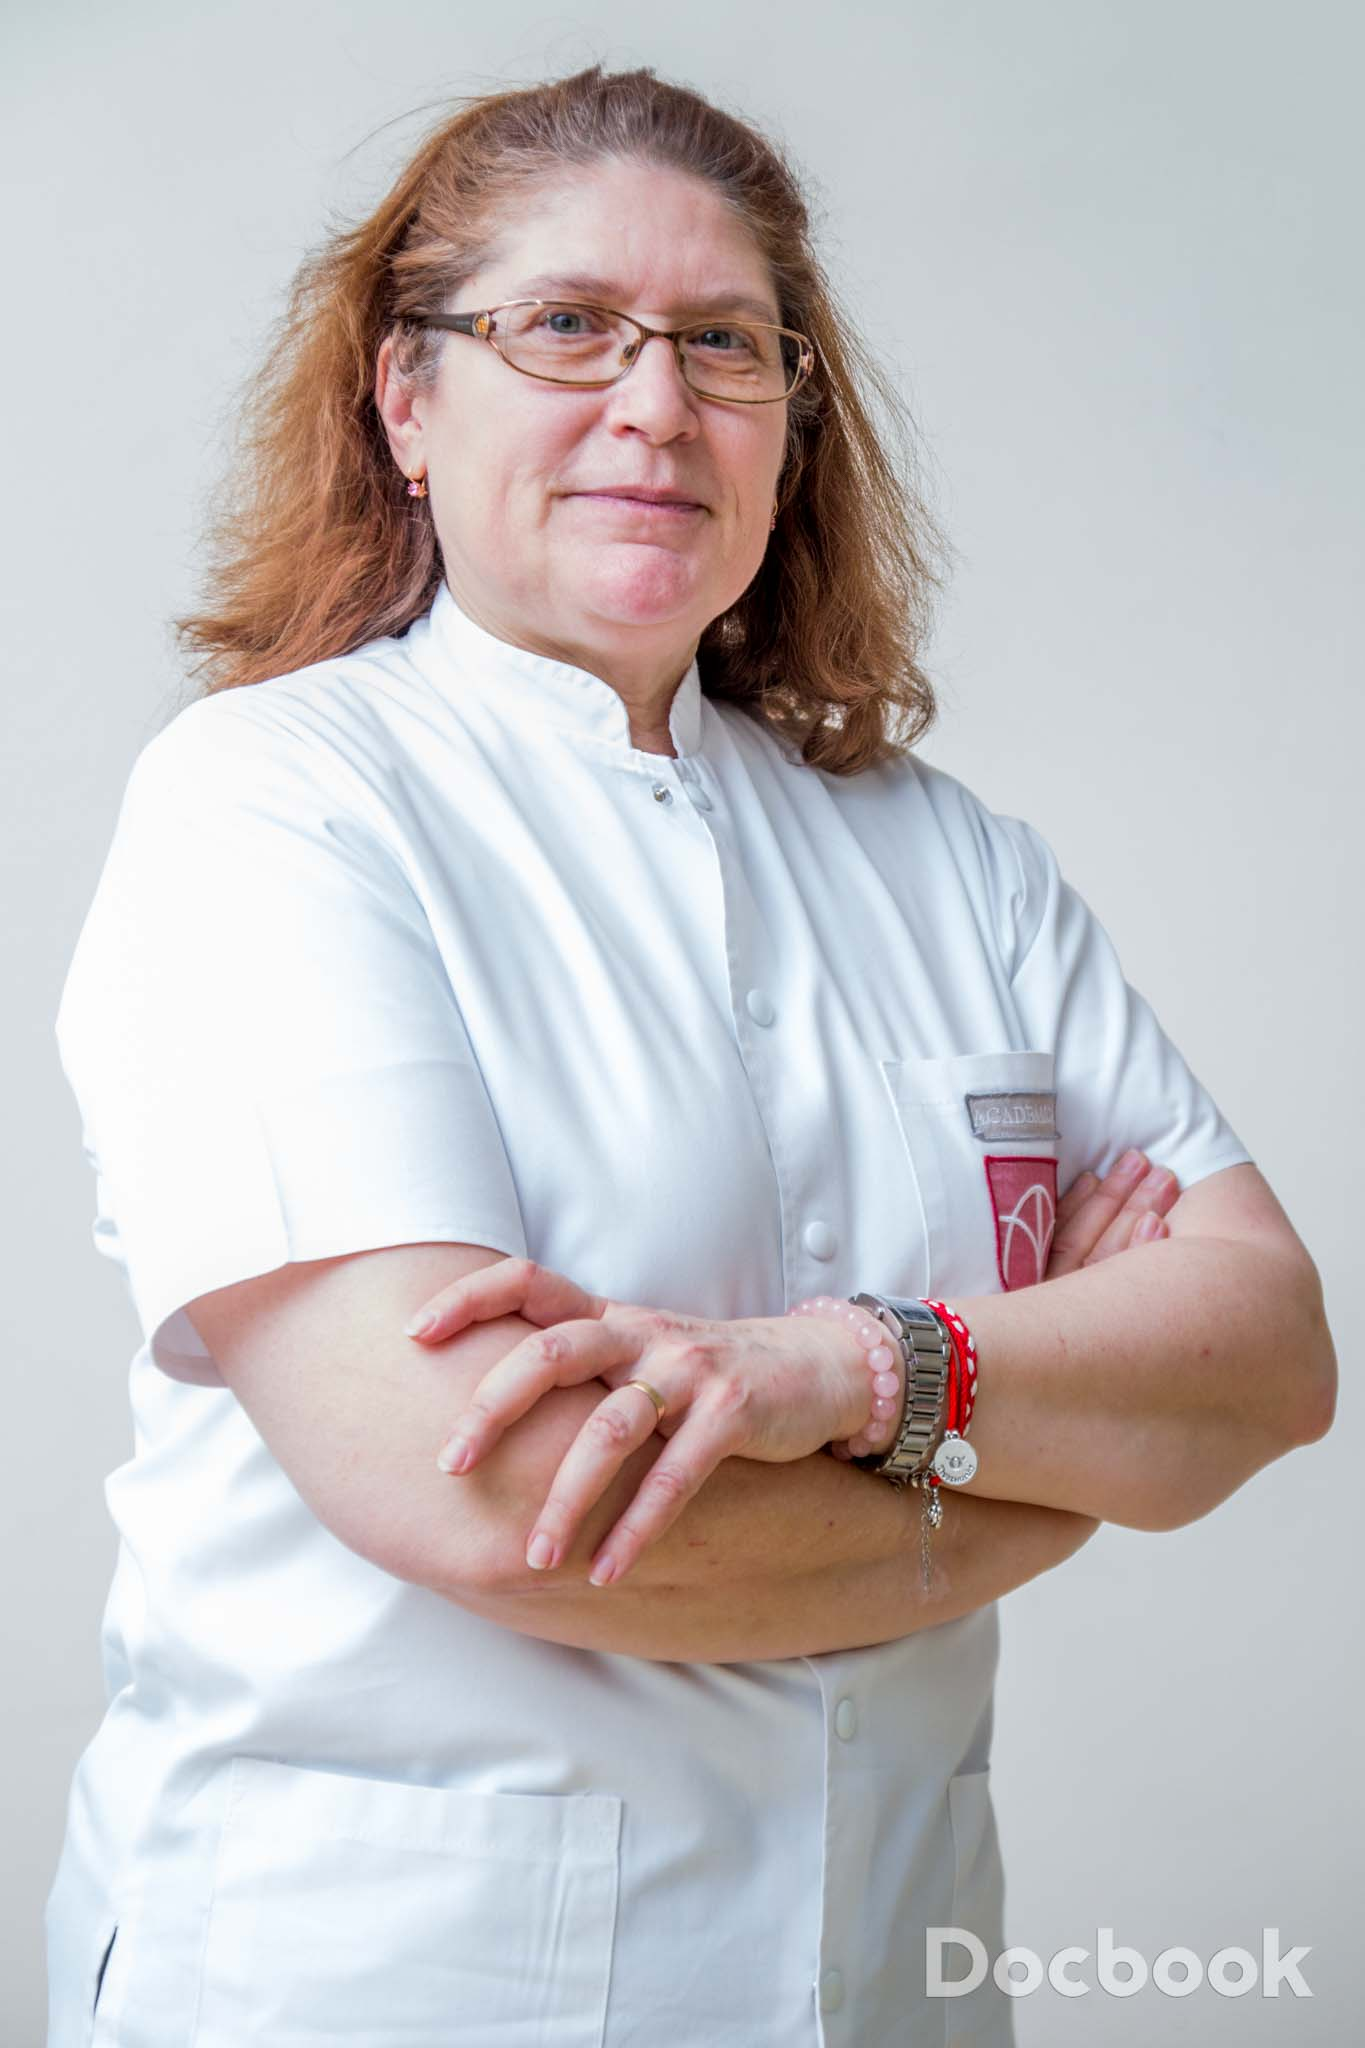 Dr. Magda Petrache